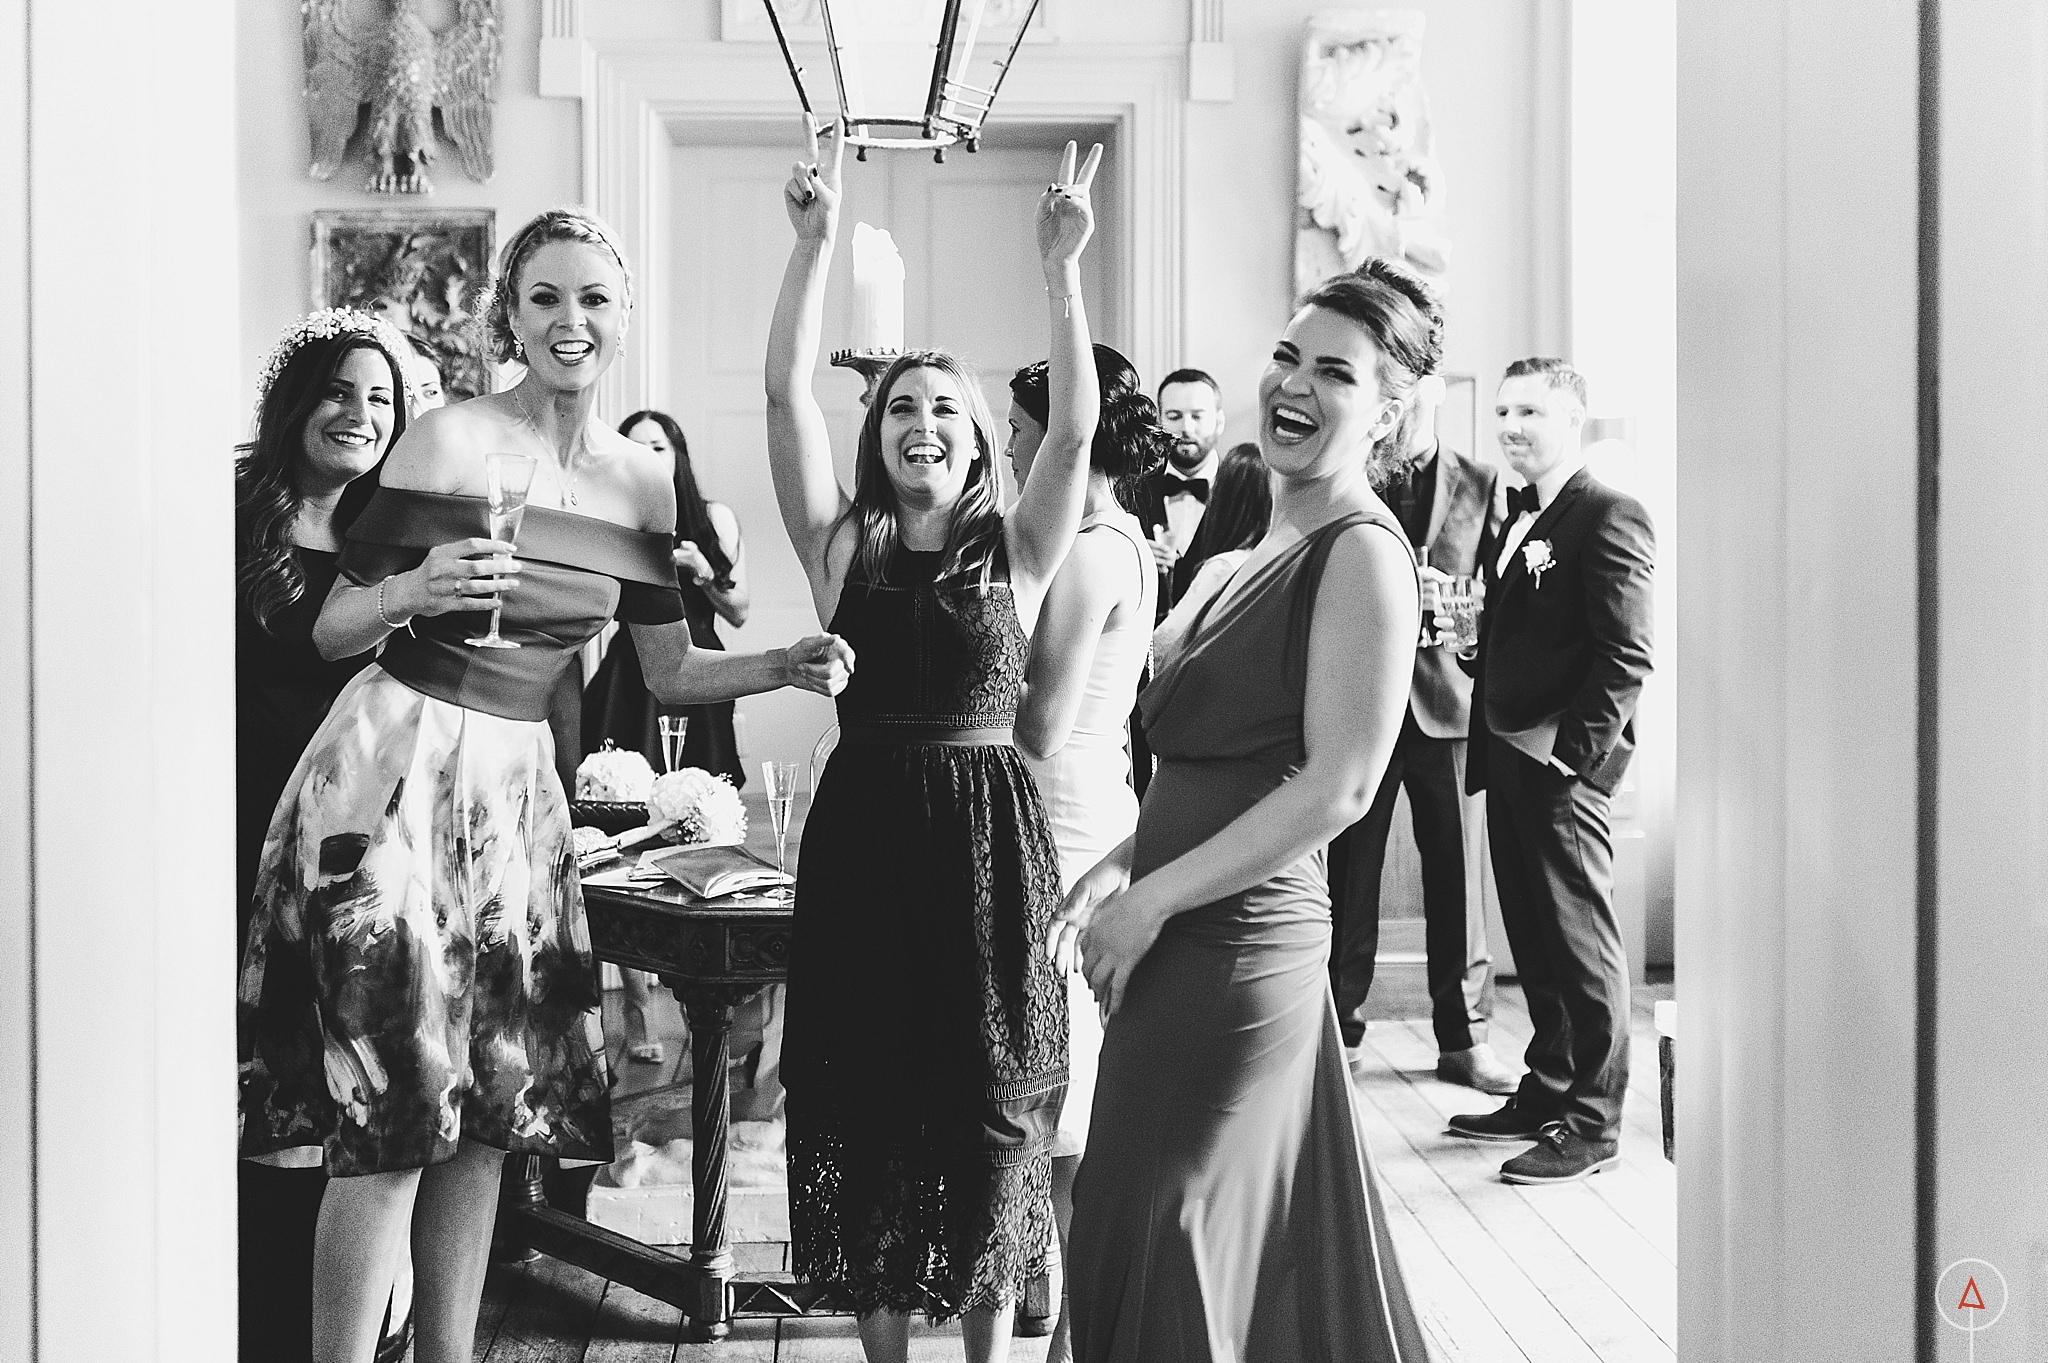 cardiff-wedding-photographer-aga-tomaszek_0273